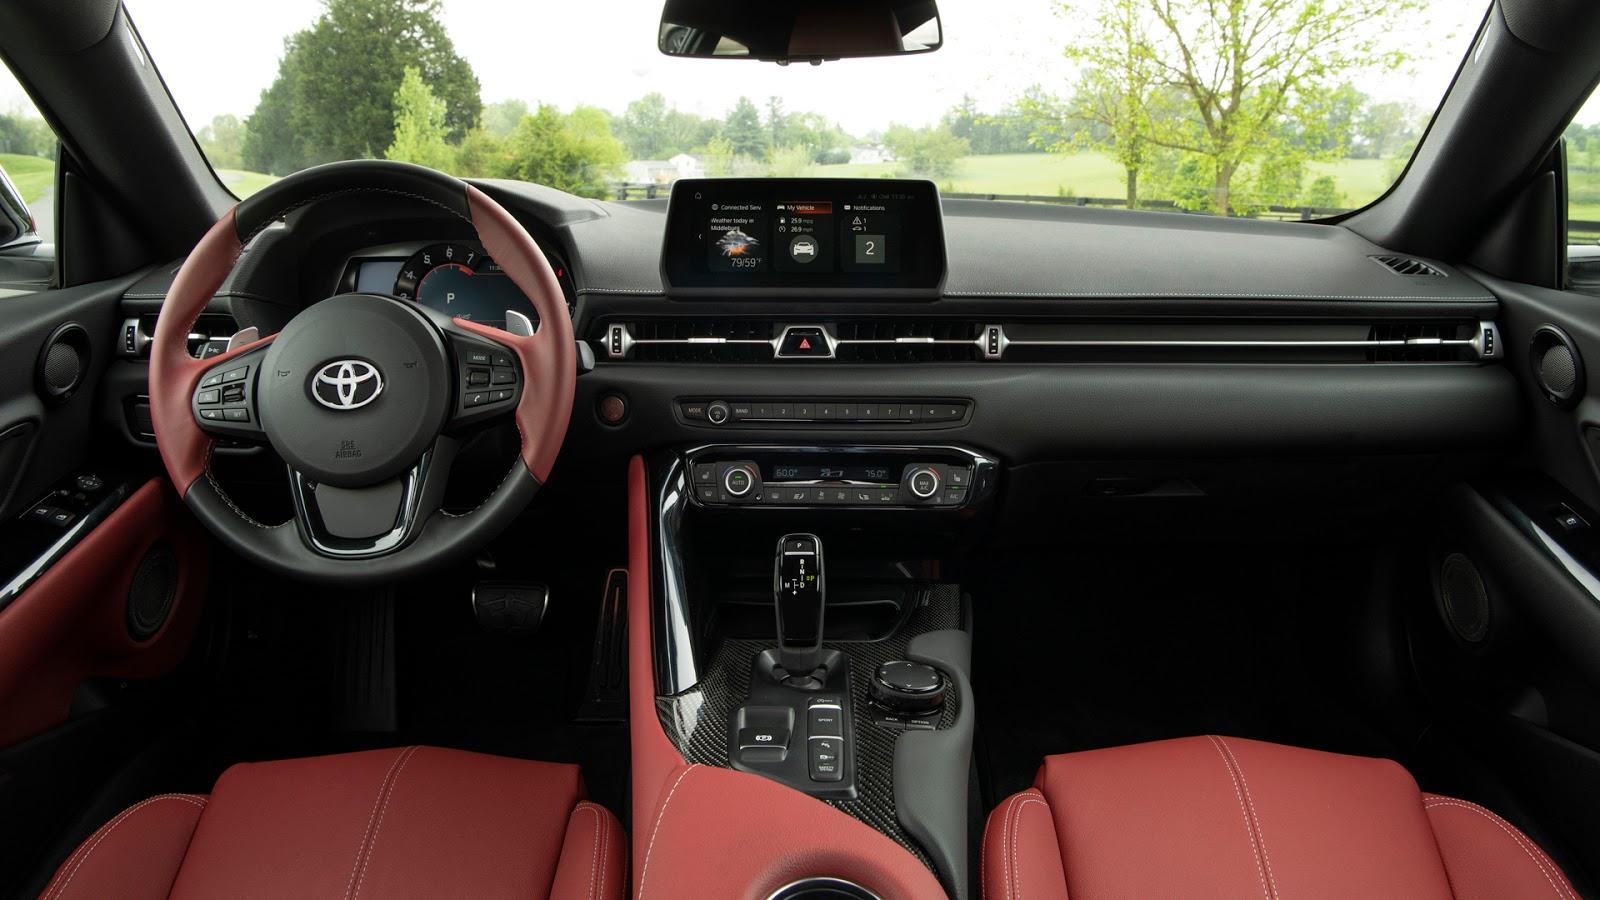 Toyota+Supra+Interior+%25281%2529.jpg